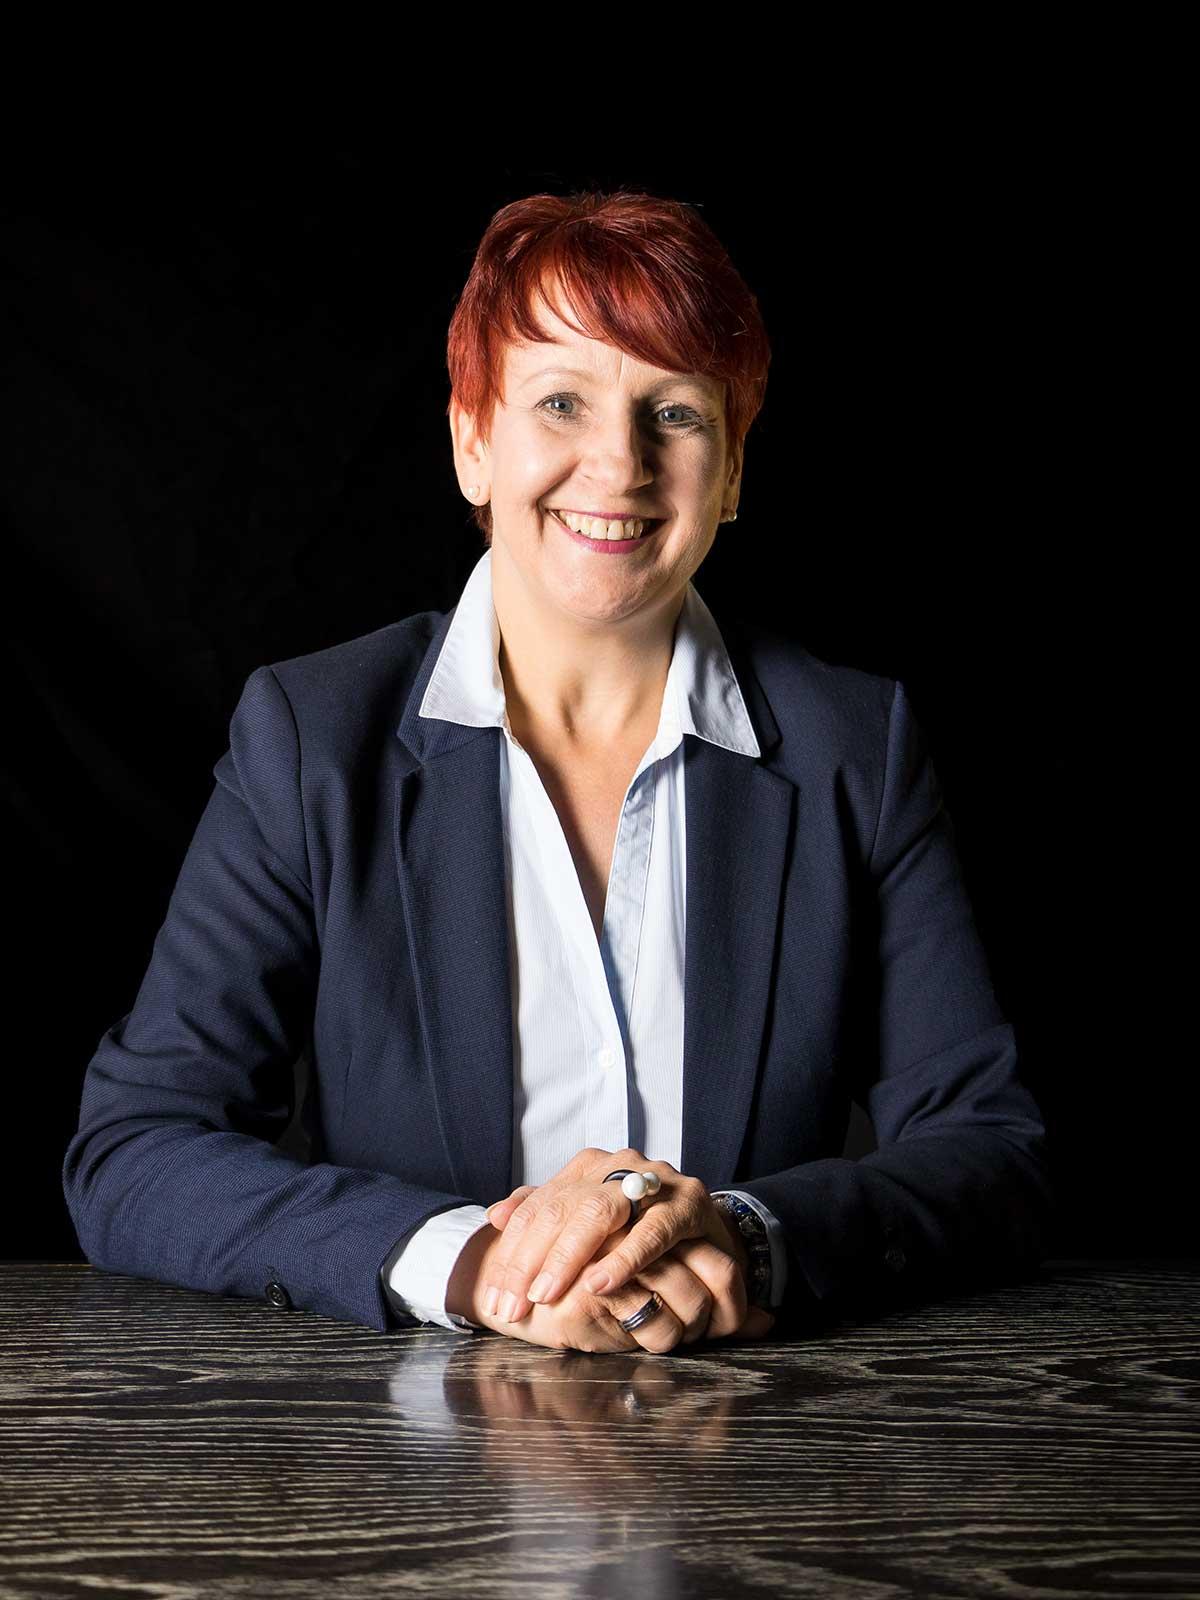 Barbara Neuhauser, verkauf innendienst, verlegerservice, leserservice, kundenberatung, avd goldach ag